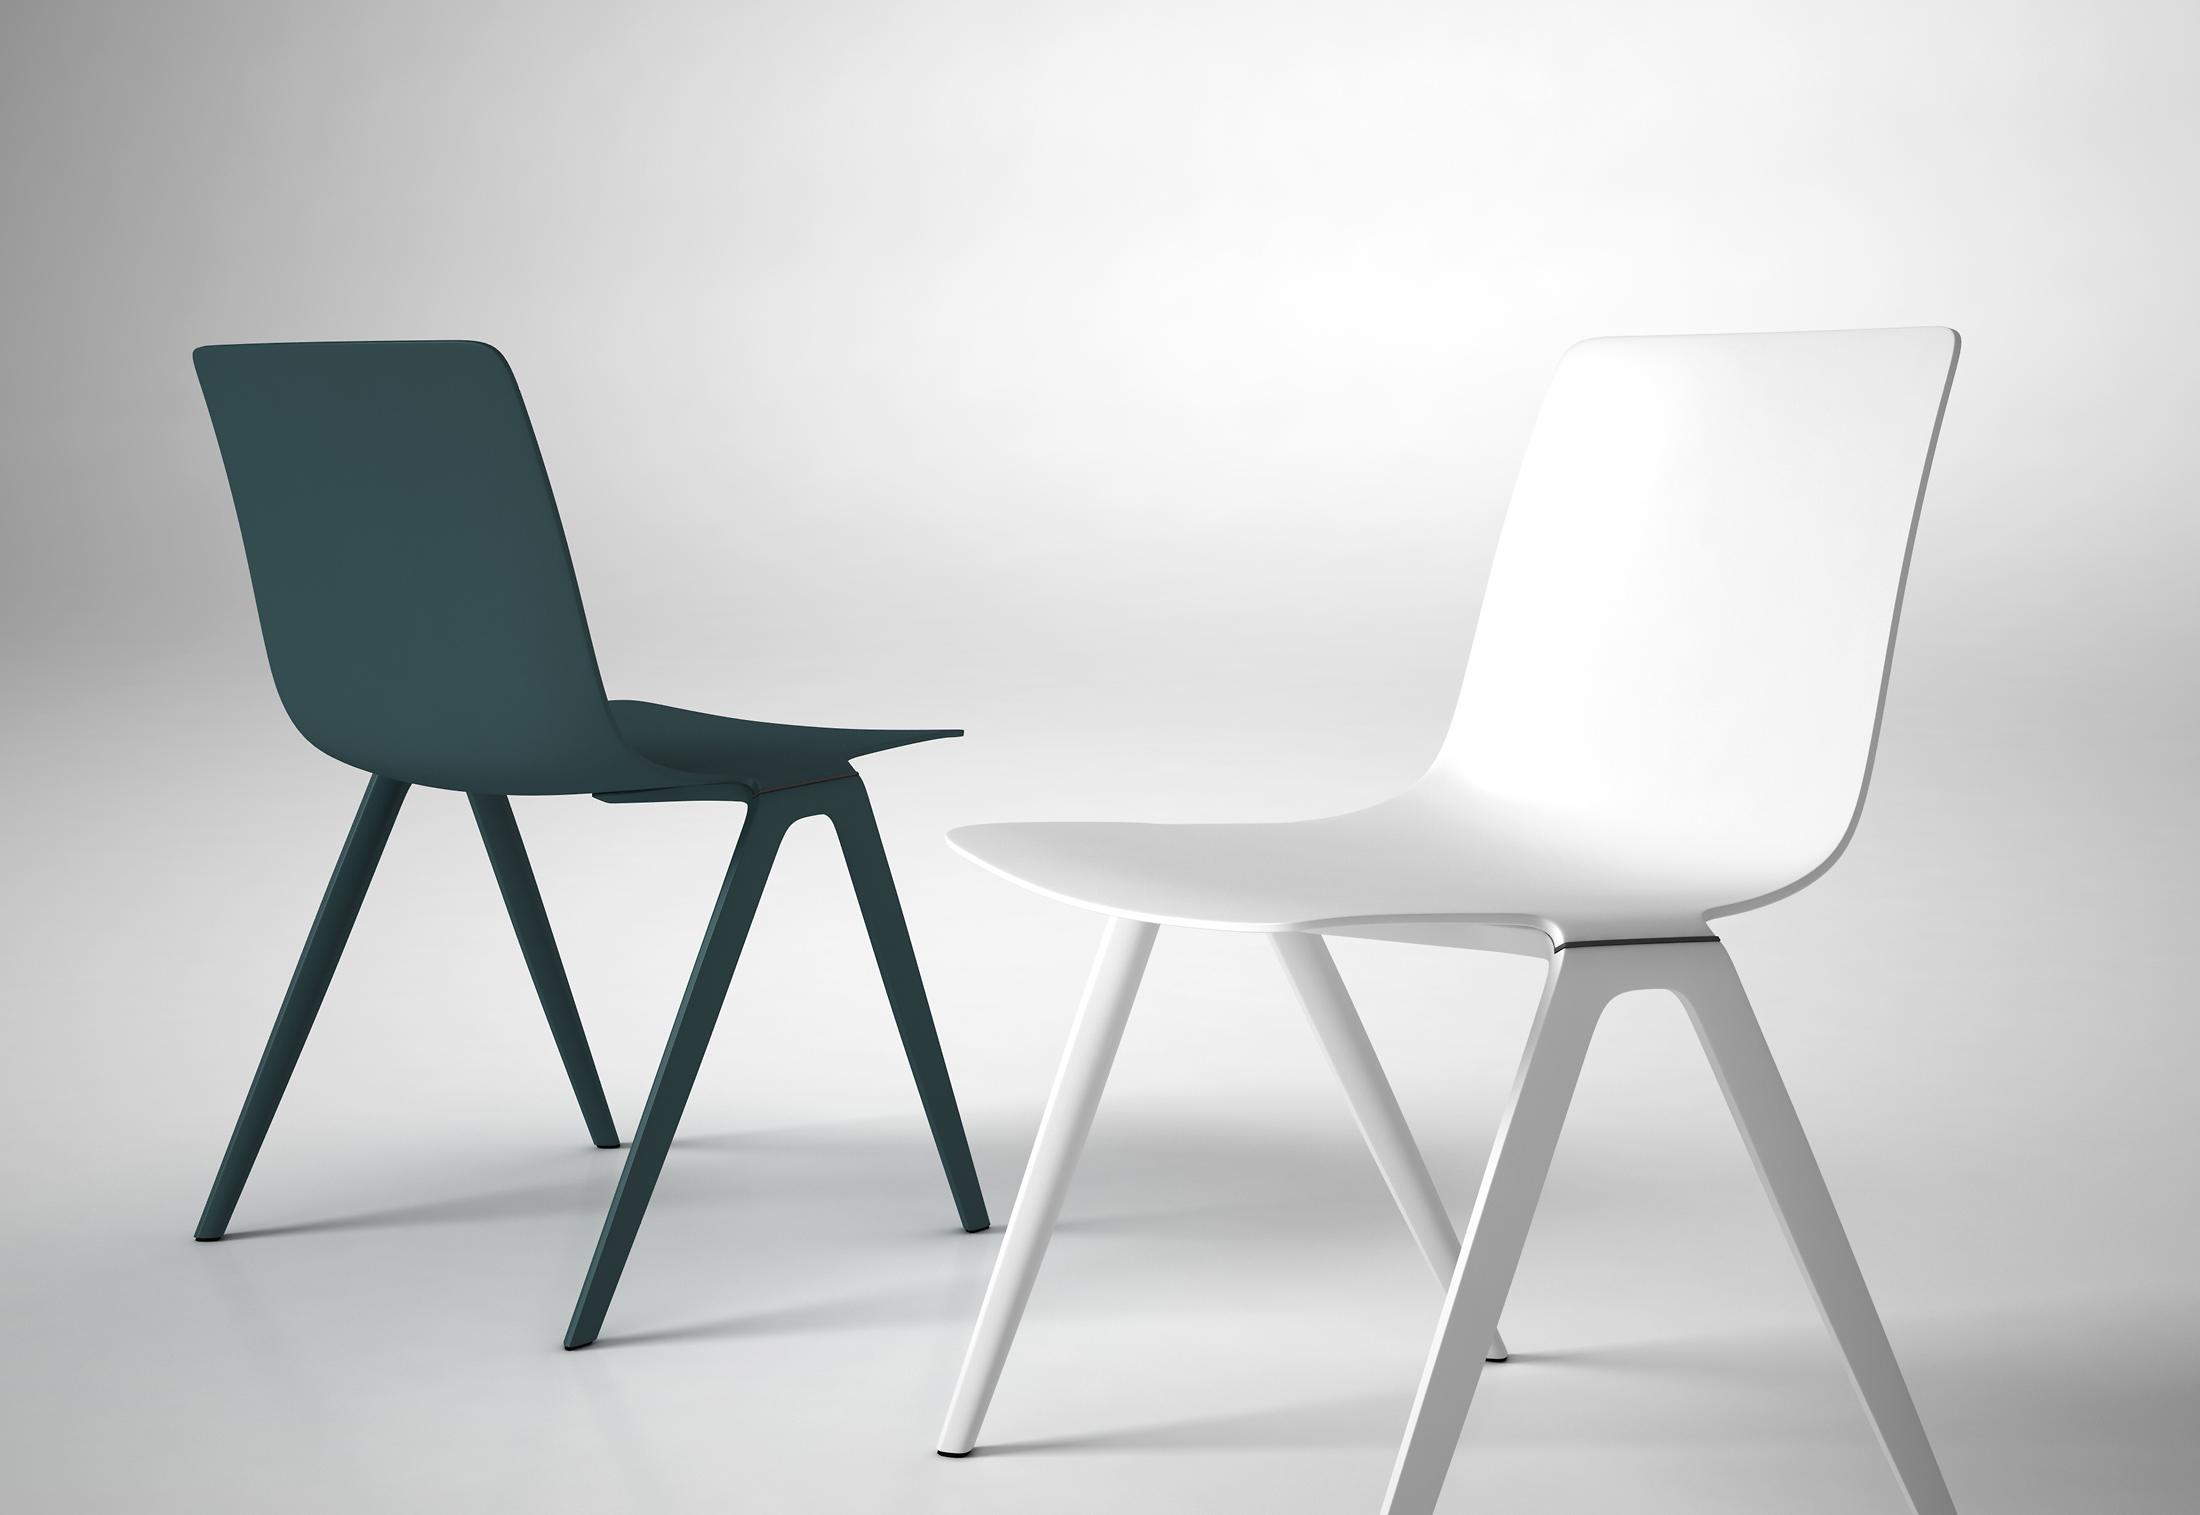 A Chair 9708 By Brunner Stylepark